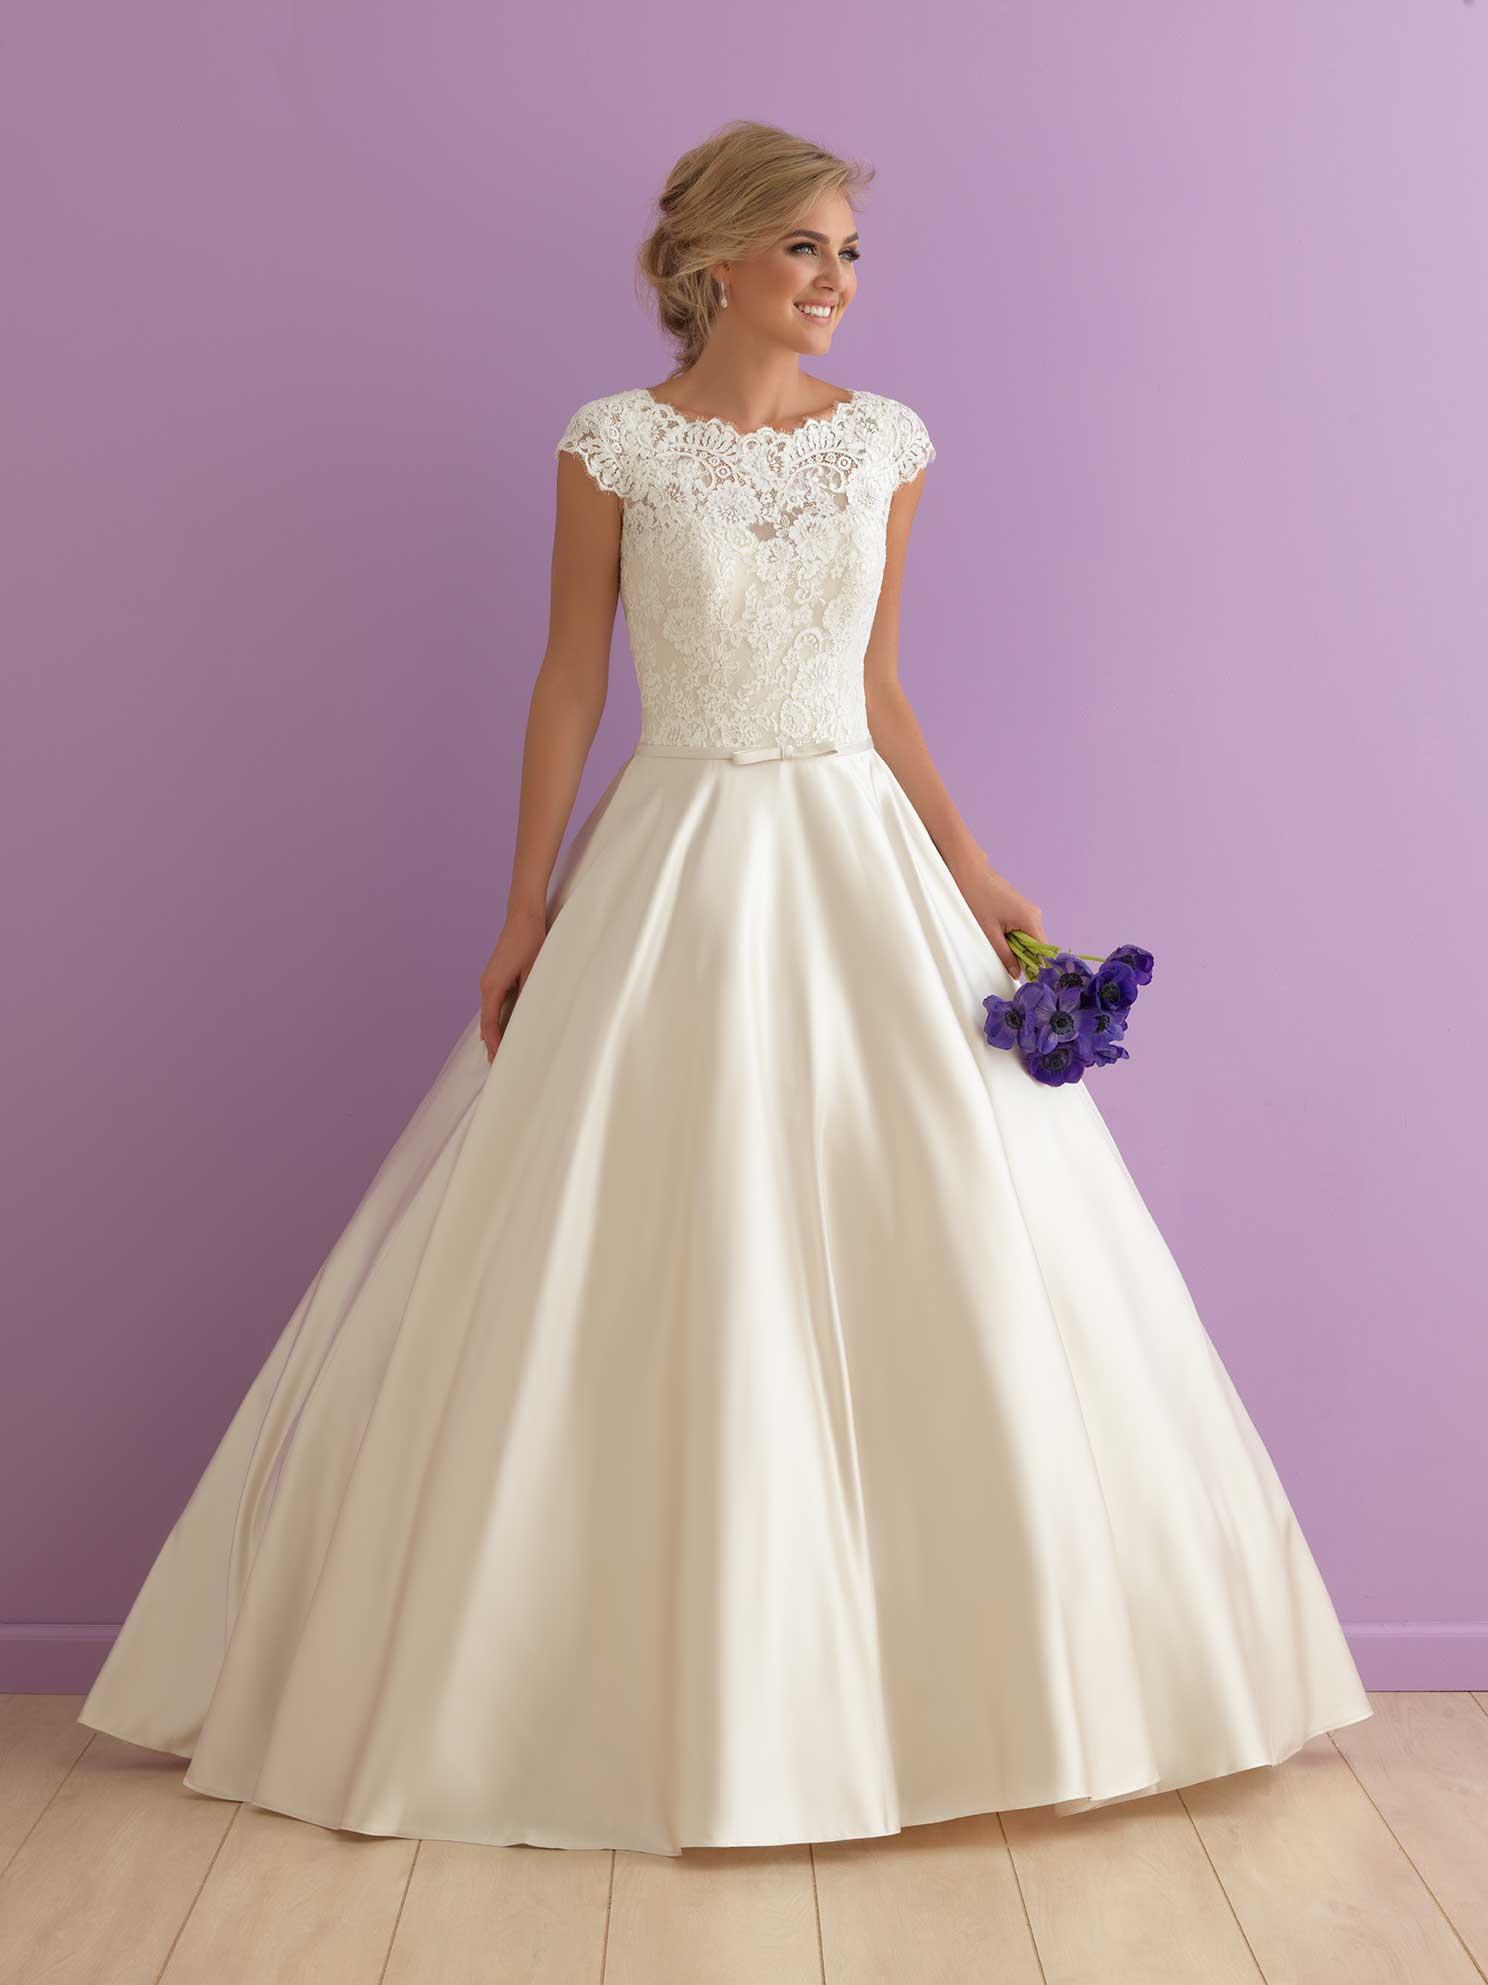 54b31f5ee8 Wedding Dresses | Bridal & Bridesmaid, Formal Gowns | Allure Bridals